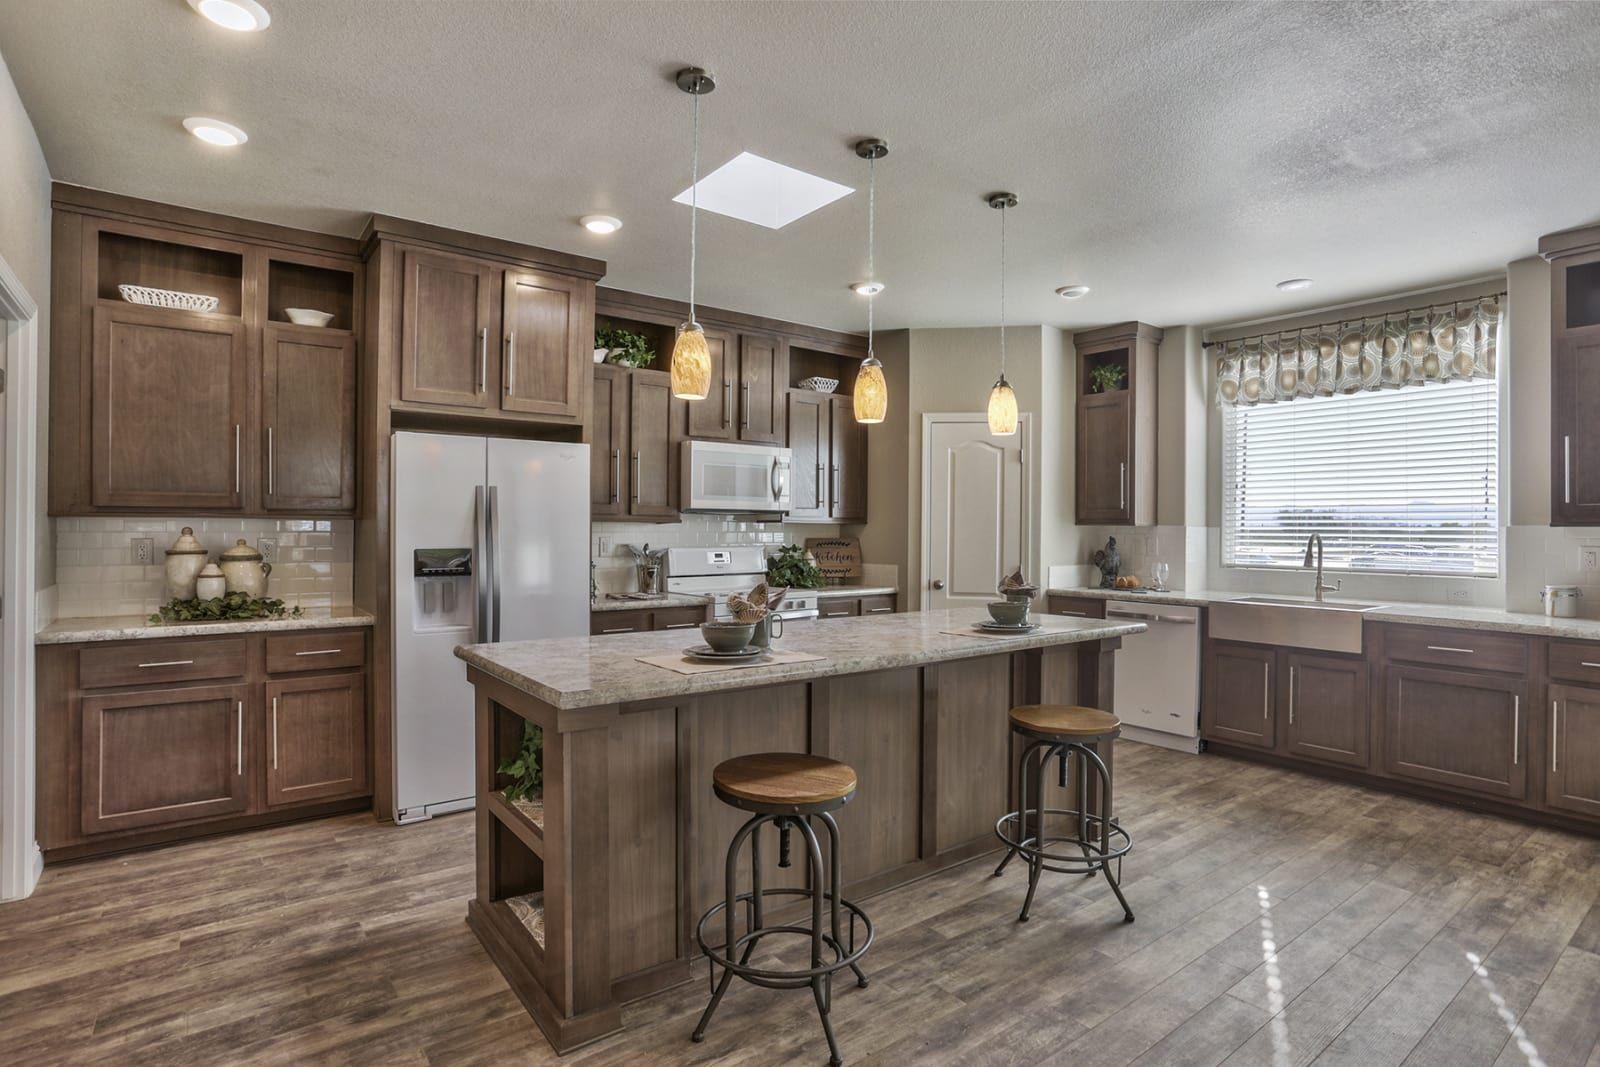 American Freedom 3266d Champion Homes Champion Homes Kitchens